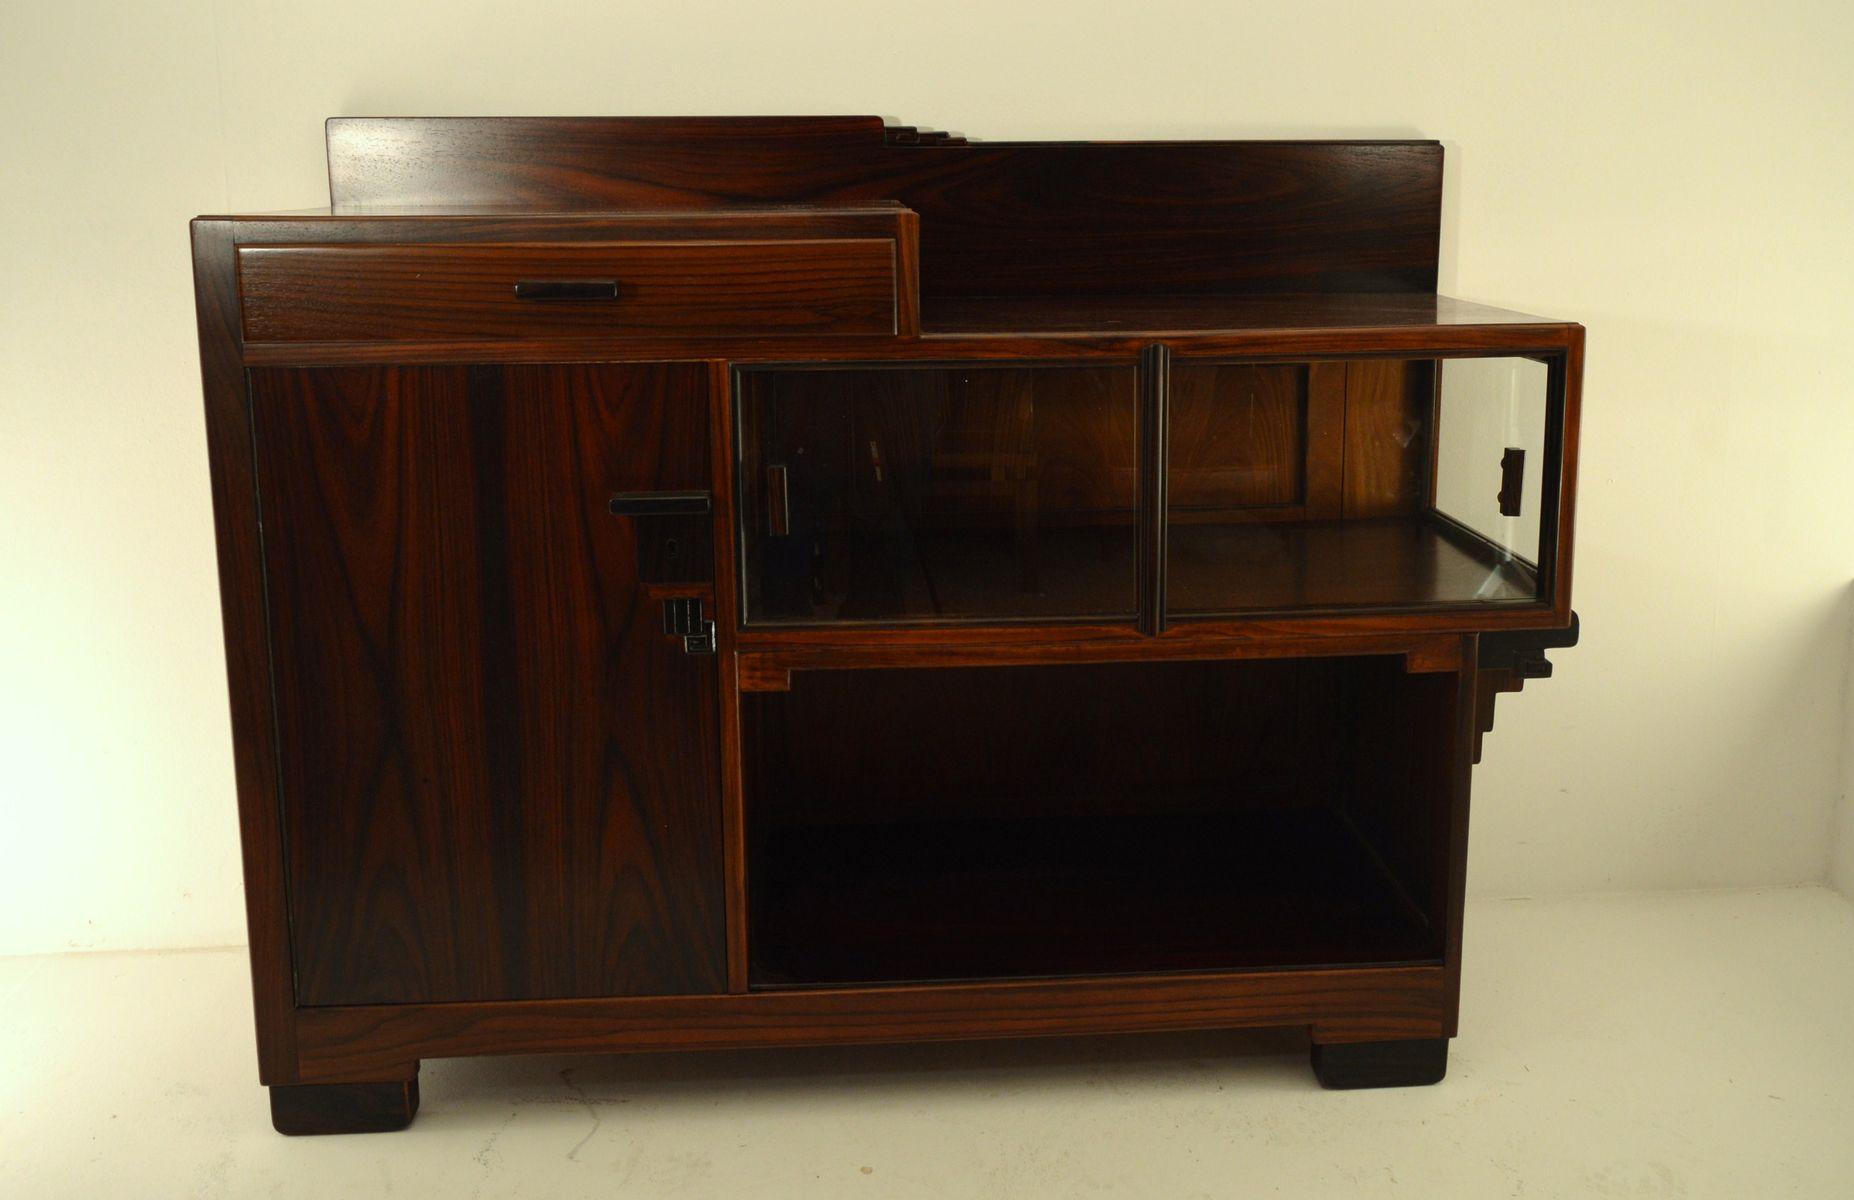 amsterdamer schule k chenschrank aus palisander ebenholz 1930er bei pamono kaufen. Black Bedroom Furniture Sets. Home Design Ideas